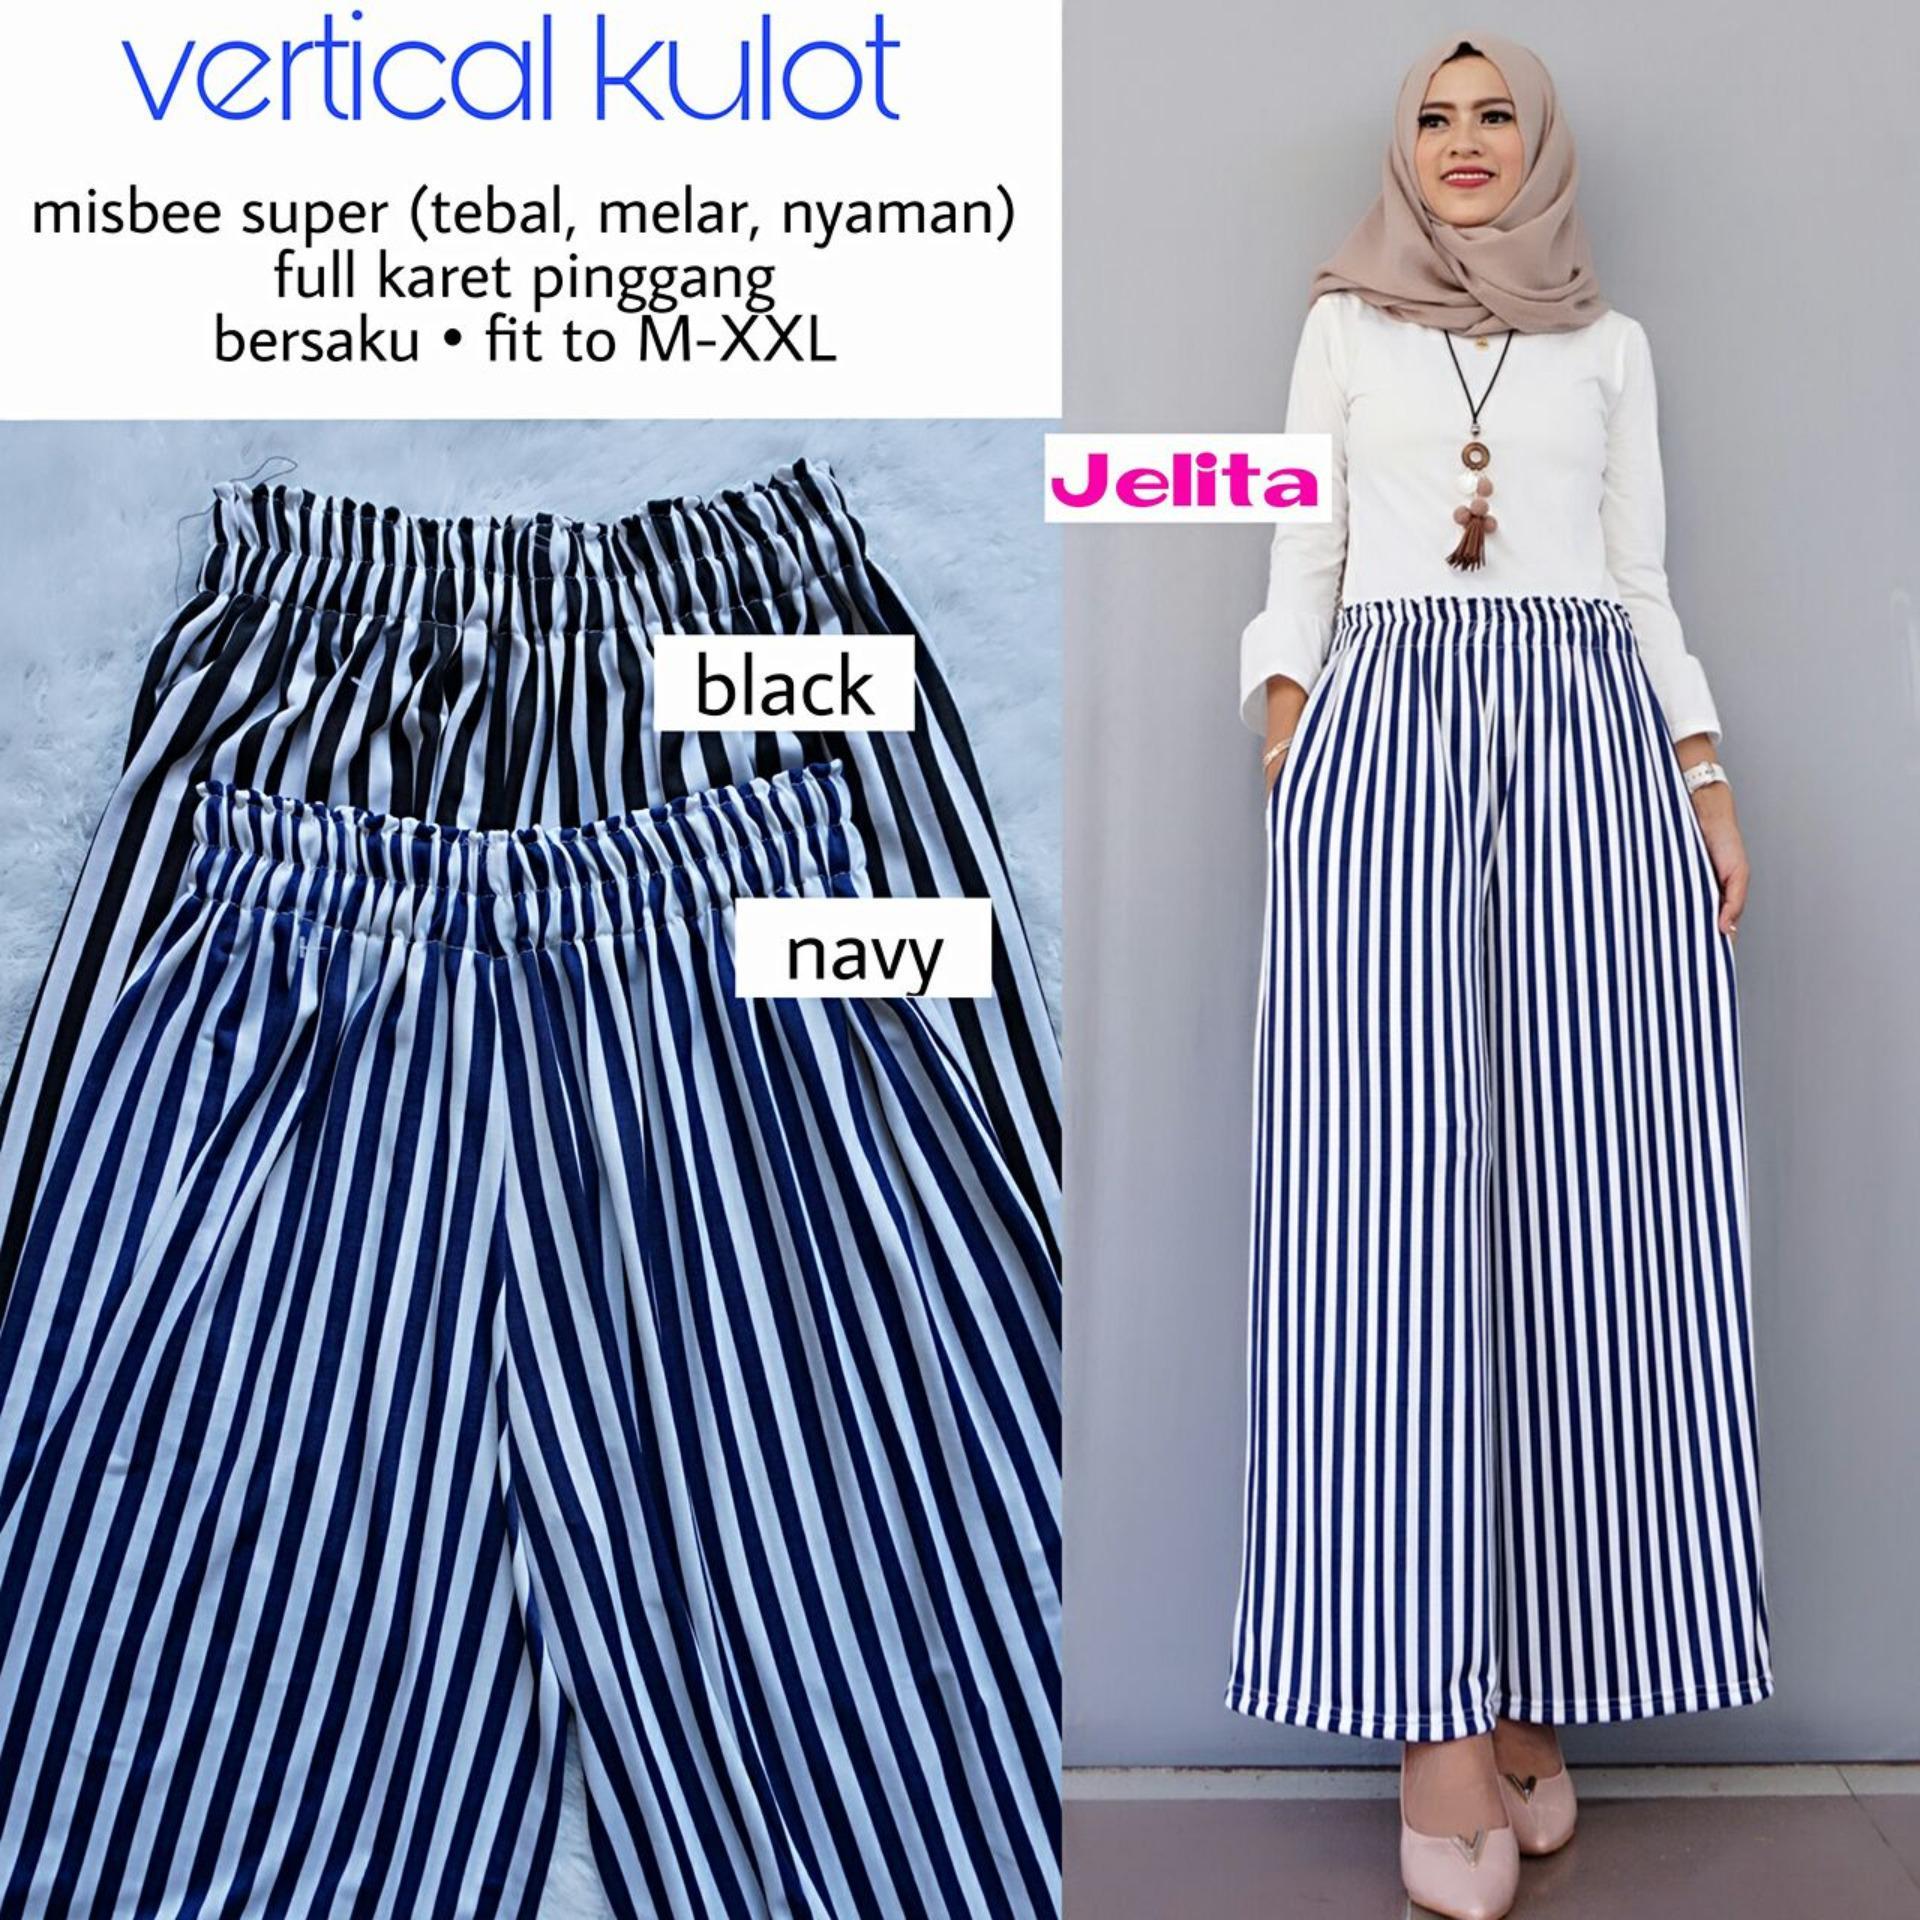 Jo Nic A Line Maxi Skirt Rok Hijab Fit To Xl Grey Daftar Harga Celana Abu Nie Beli Murah Diskon Pleated Long Skirts Panjang Lipit Up